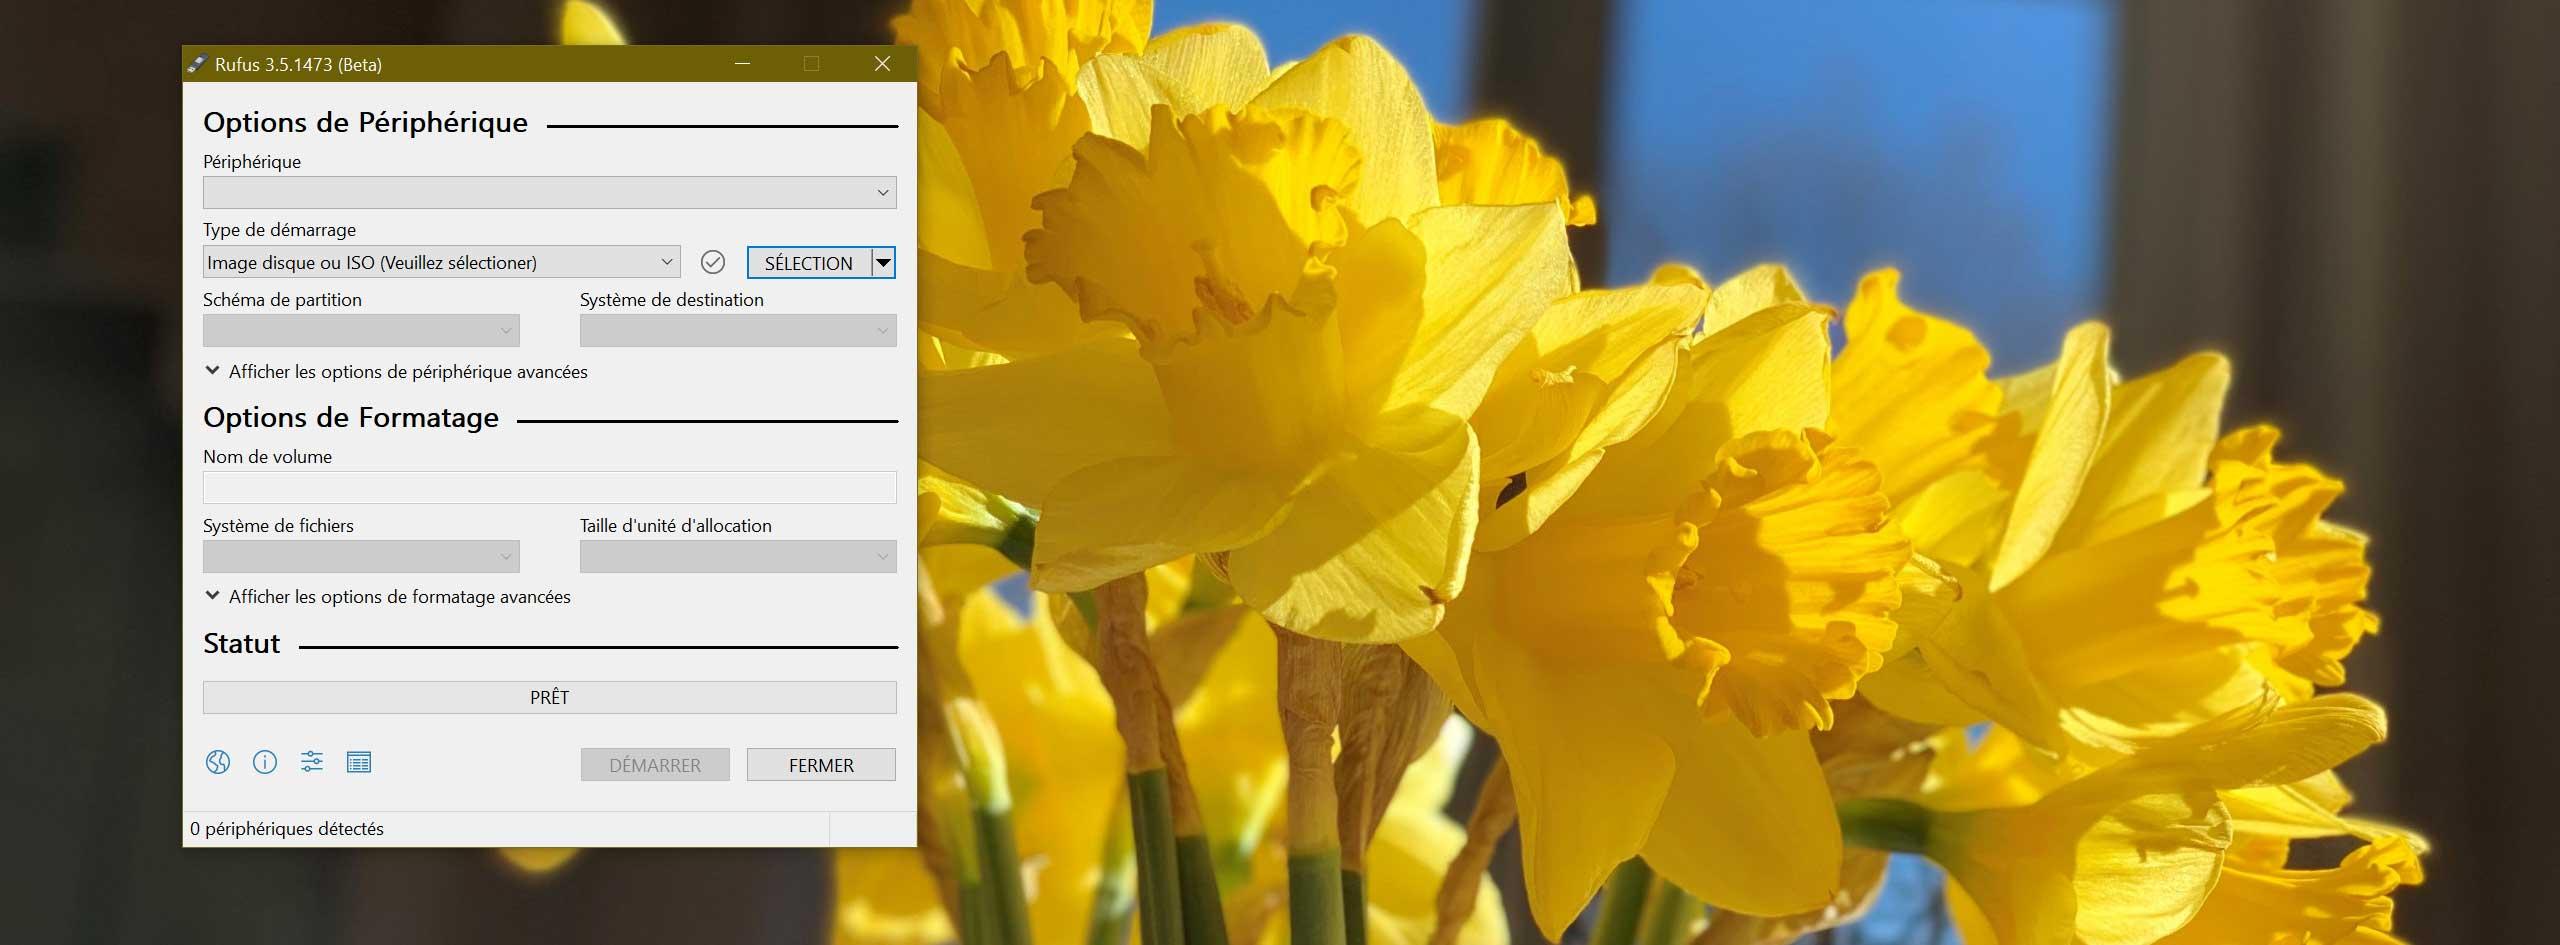 Windows 8 Pro 32 Bit / 64 Bit ISO Download FREE - Torrent ...